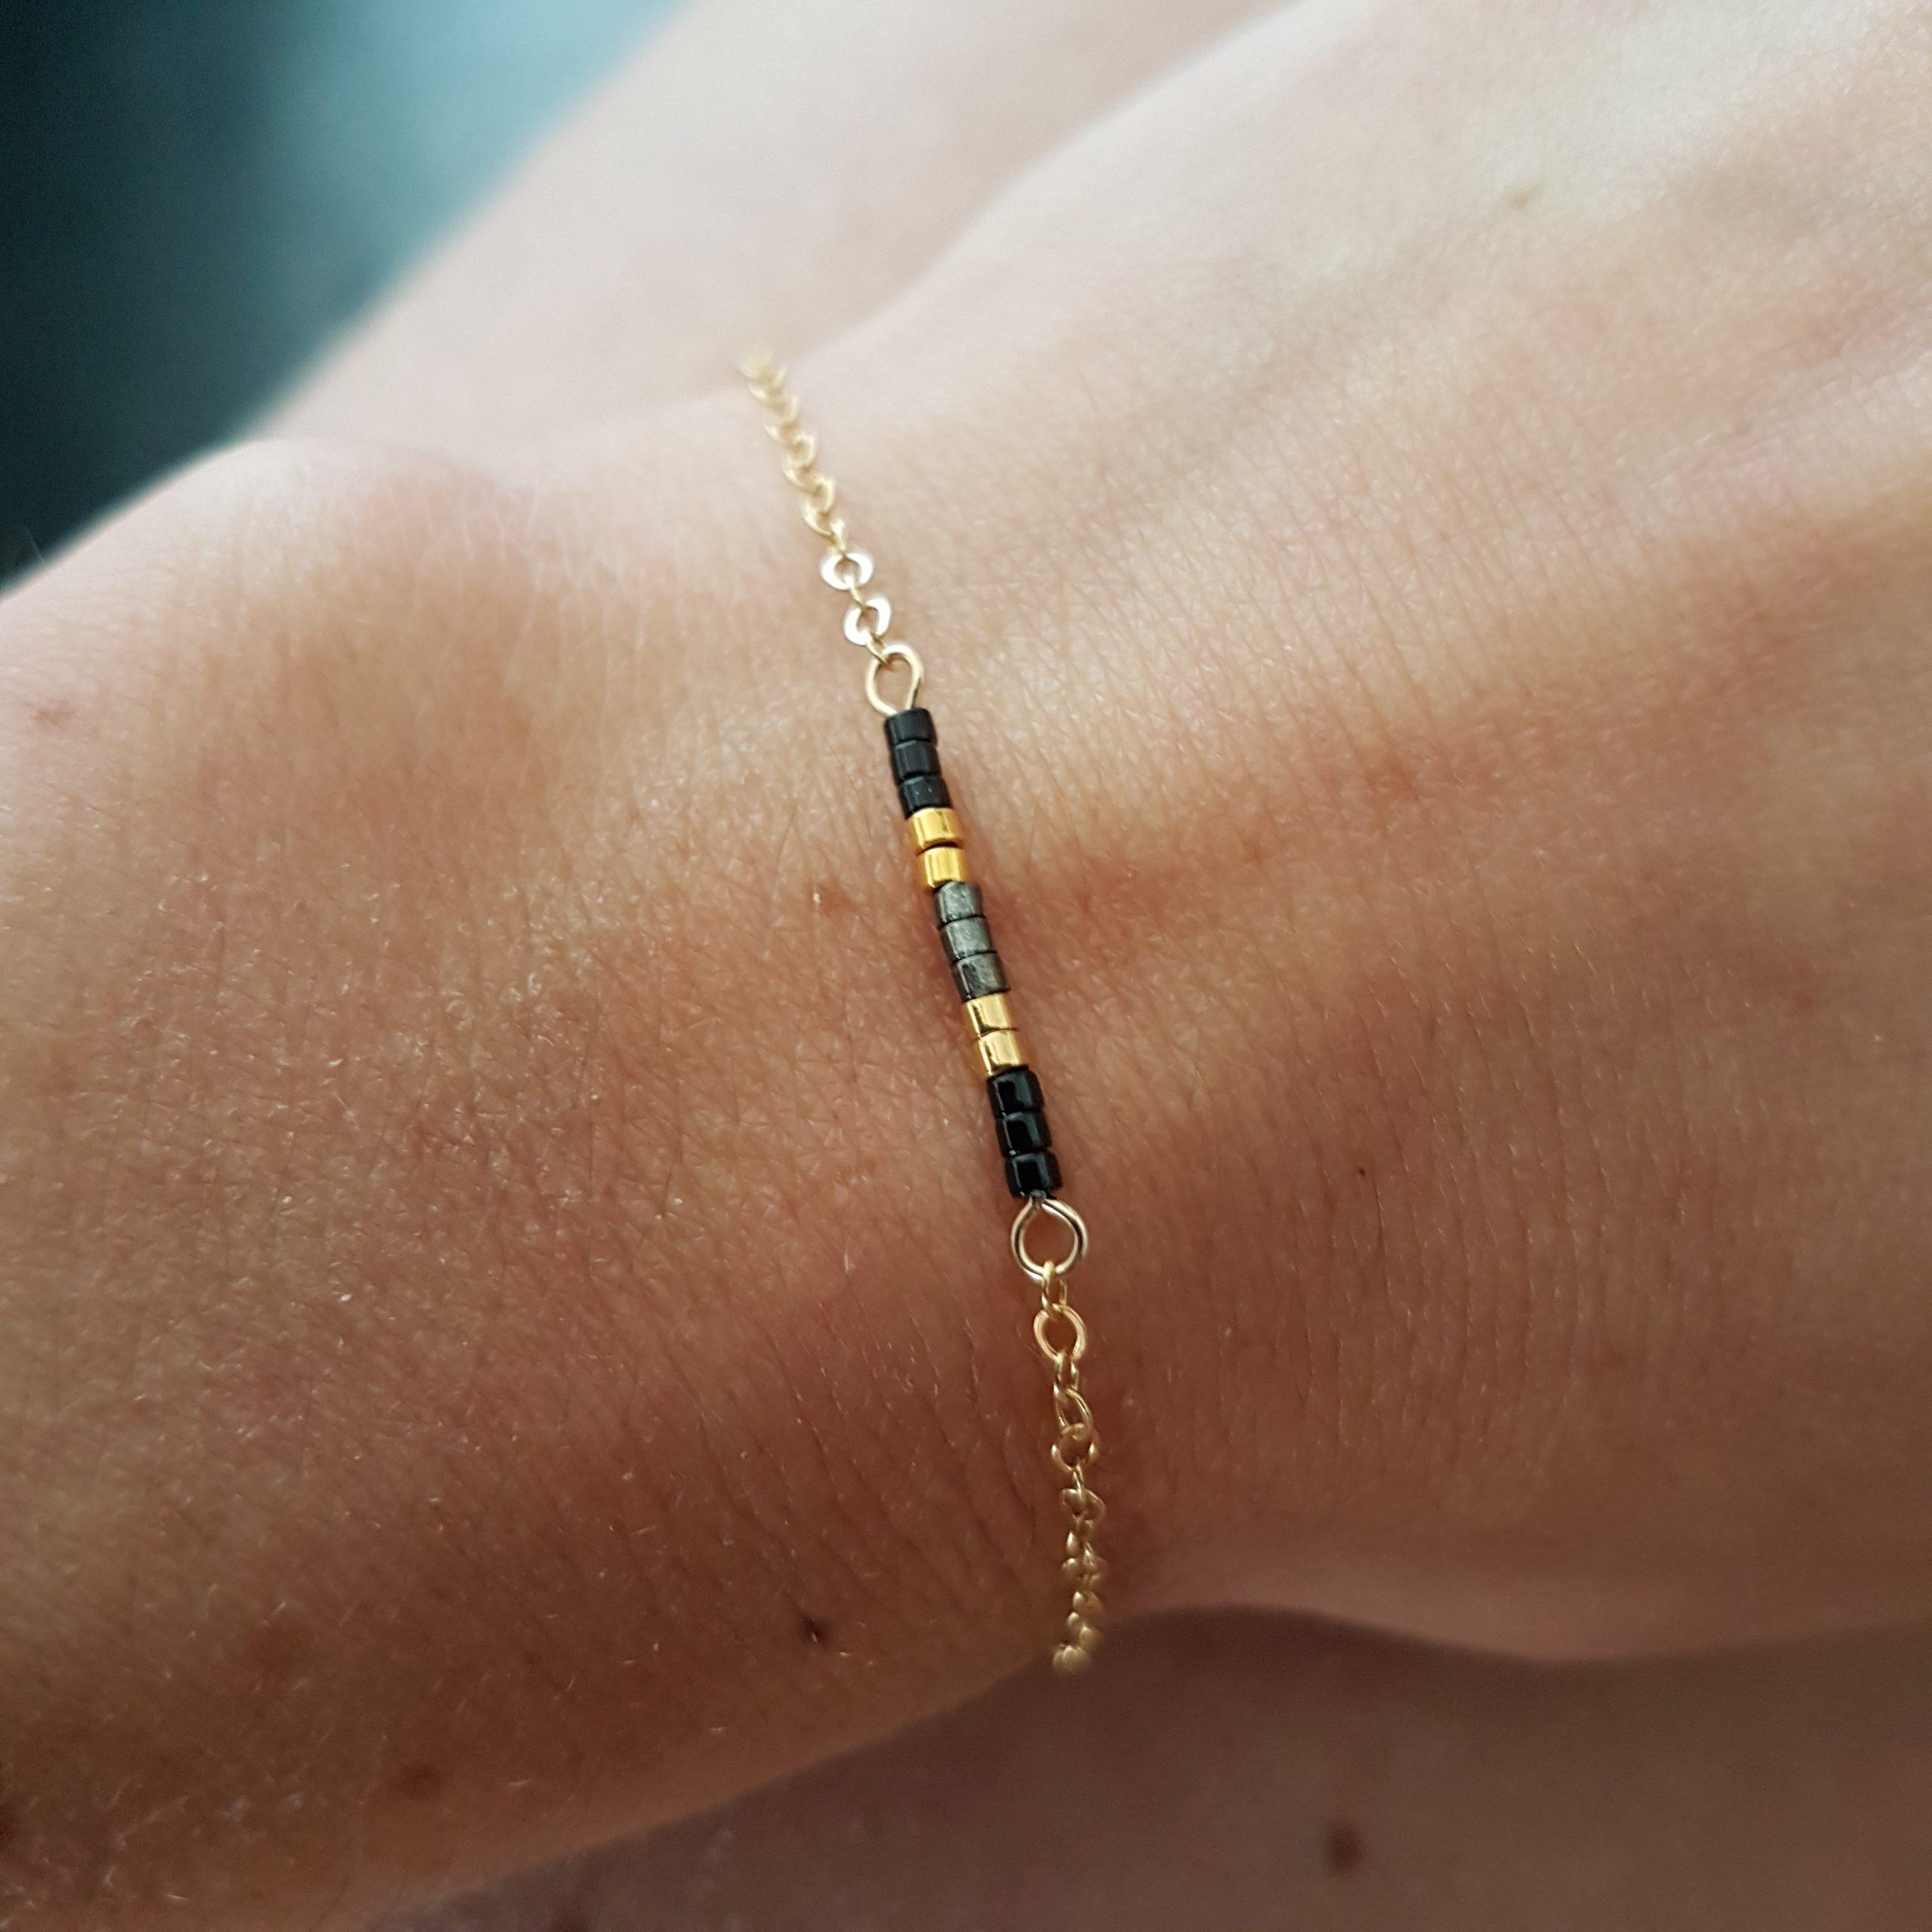 Cadeau Bijou artisanal lyon Bracelet Agathe noir plaqué or miyuki